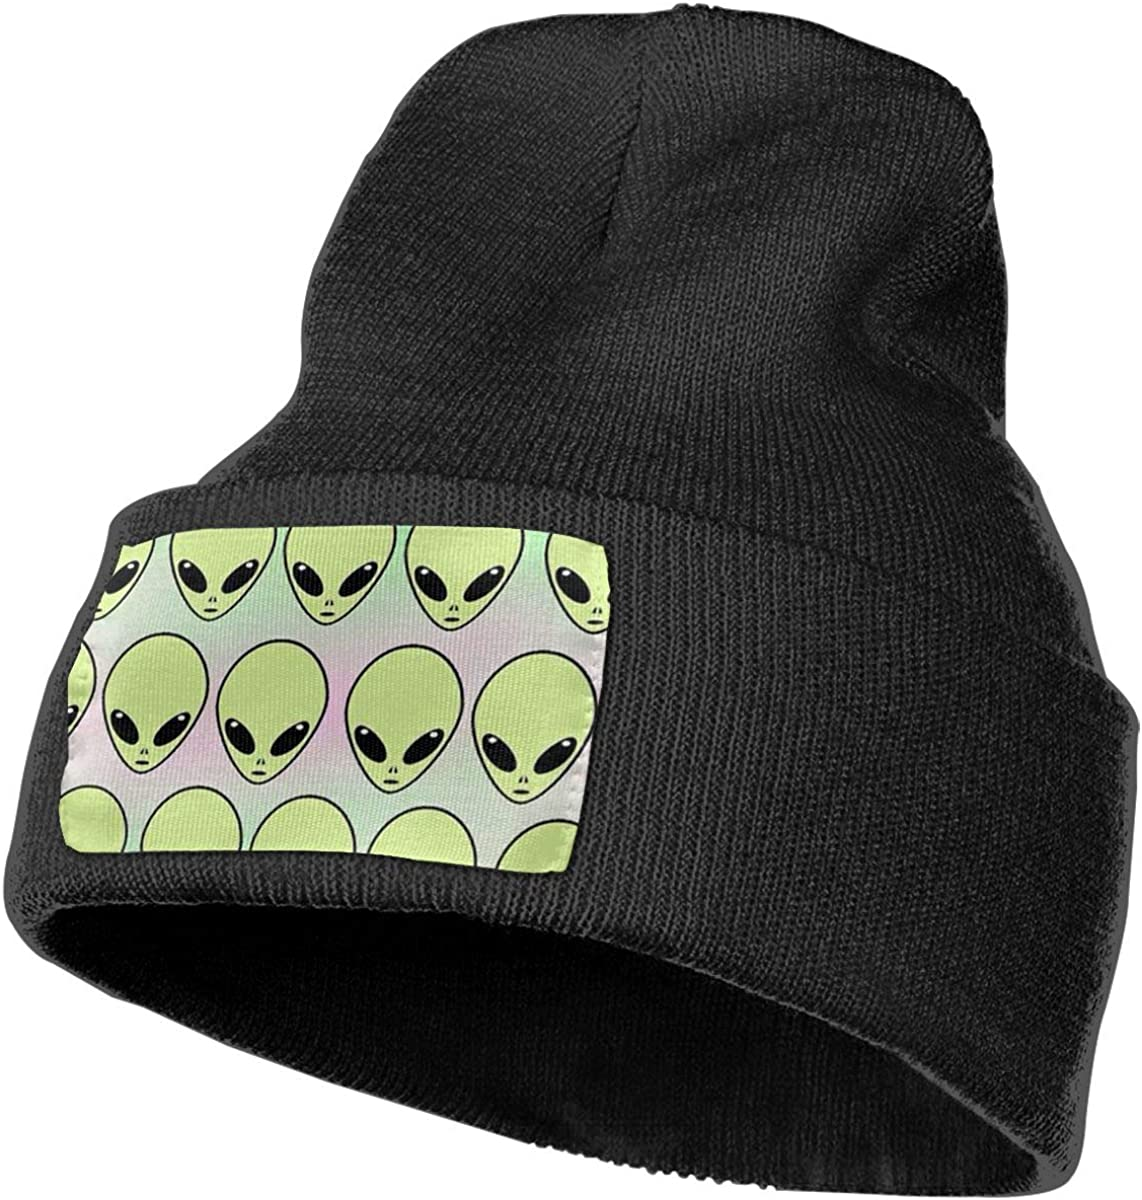 100/% Acrylic Acid Mas Beanie Hat Ruin Alien Fashion Knitting Hat for Men Women